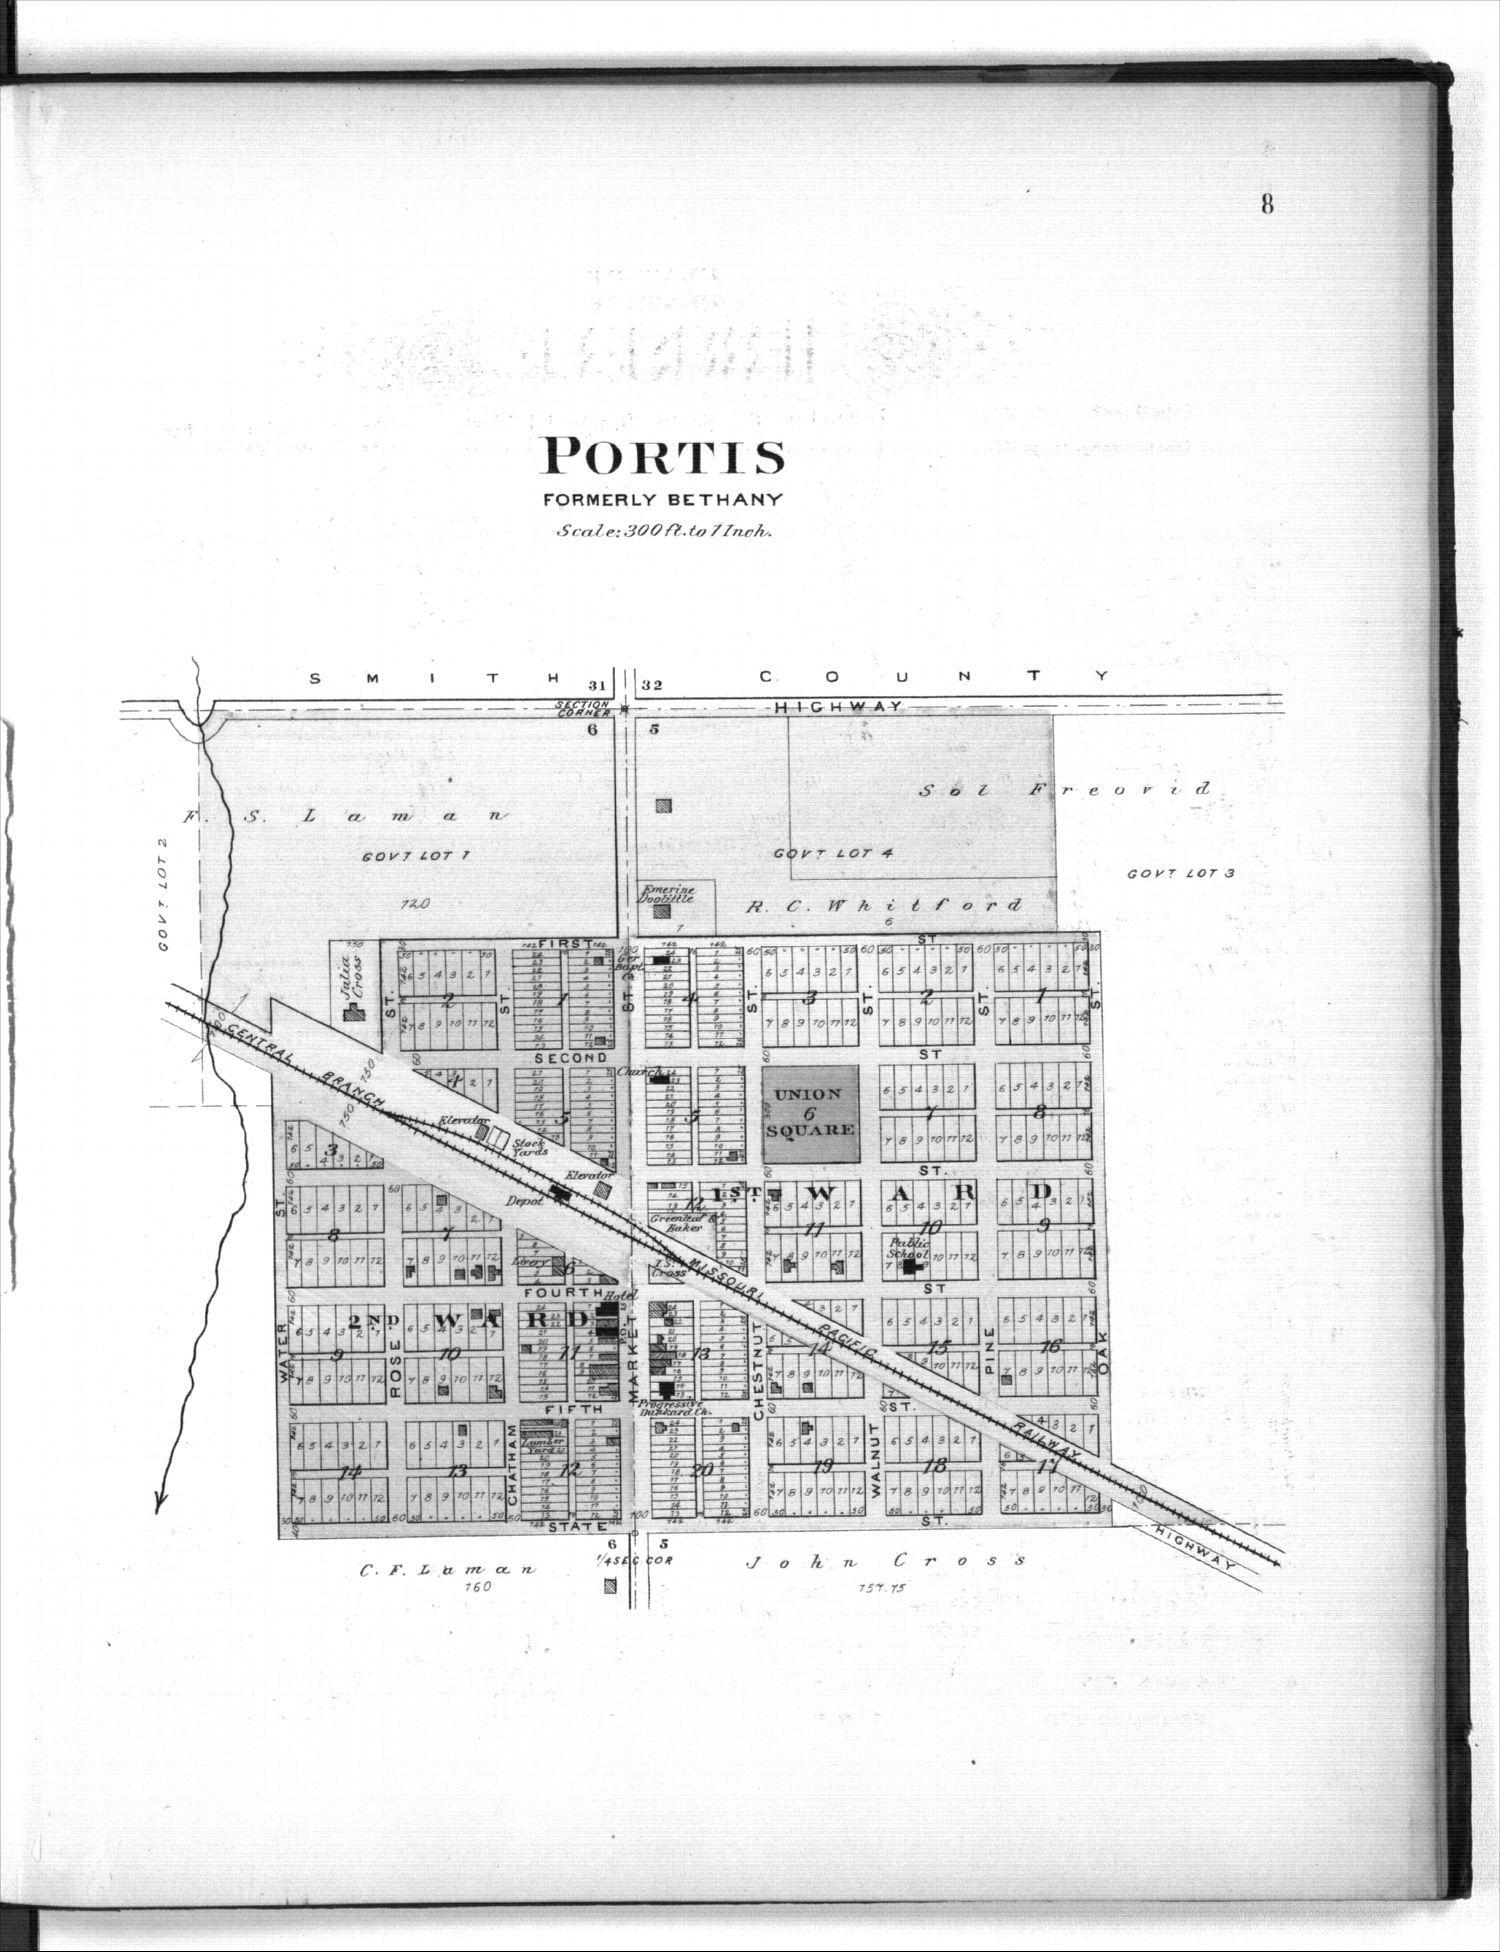 Plat book of Osborne County, Kansas - 8